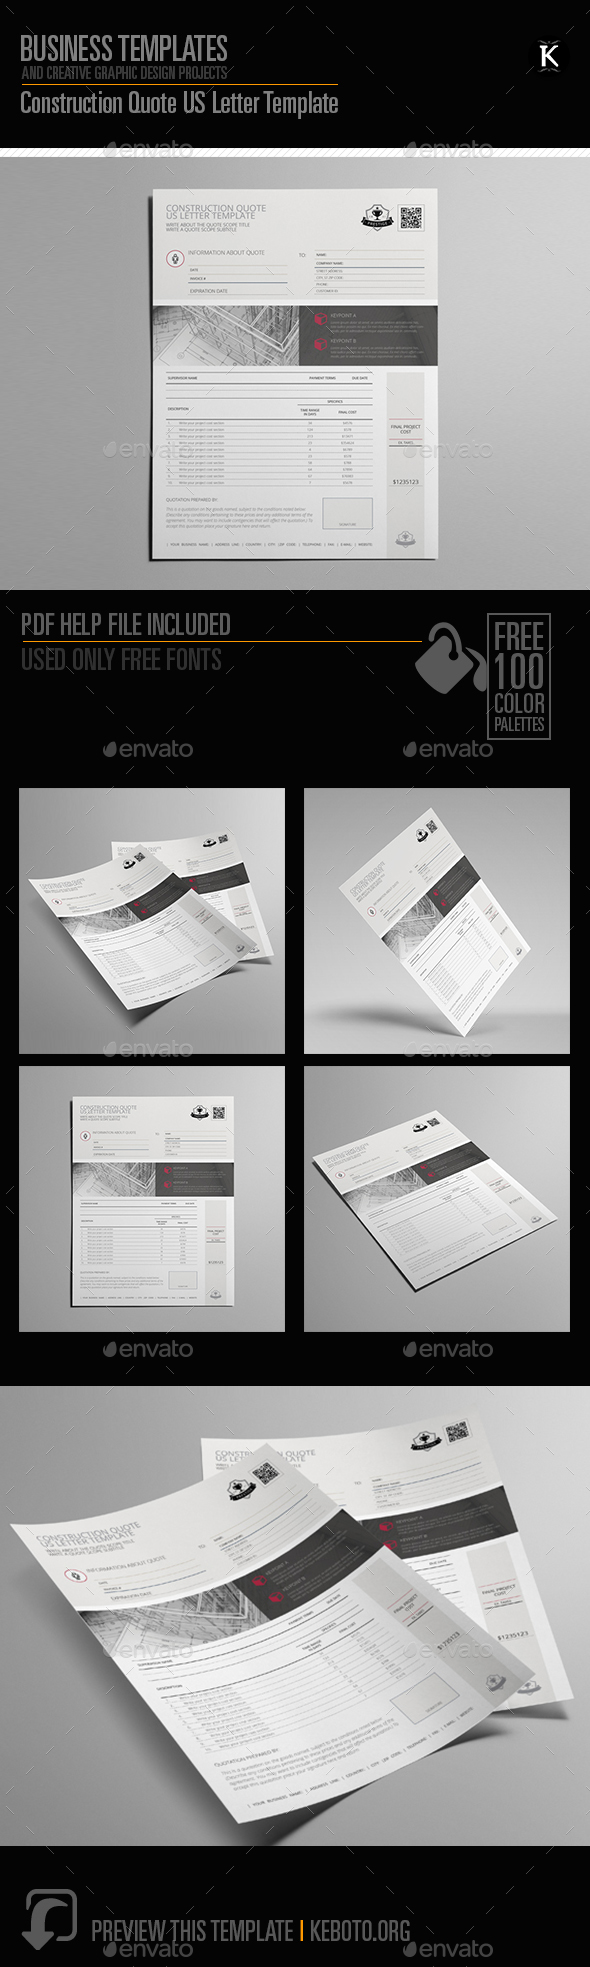 Construction Quote US Letter Template - Miscellaneous Print Templates